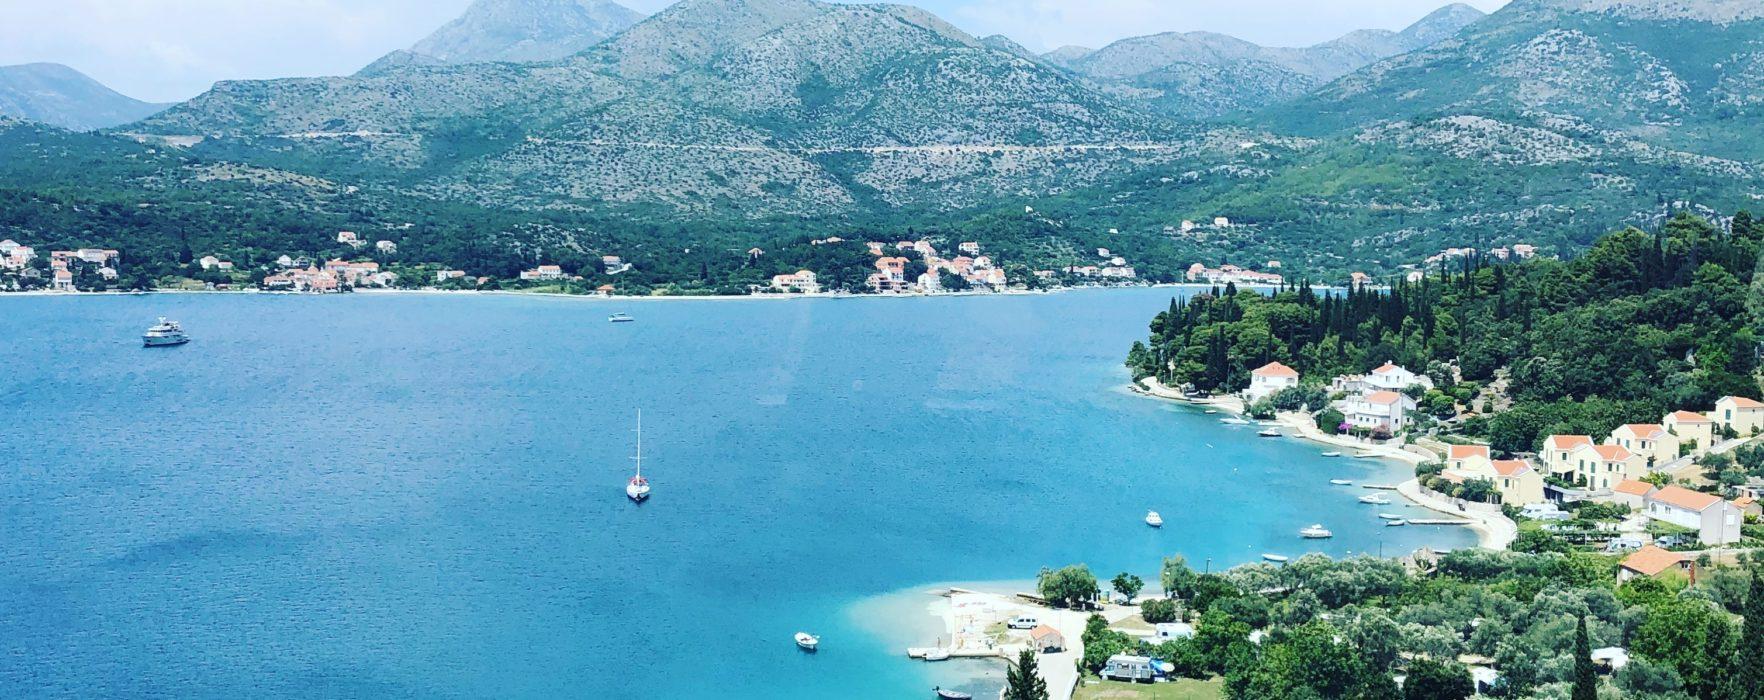 Croatia: The jewel of the Adriatic